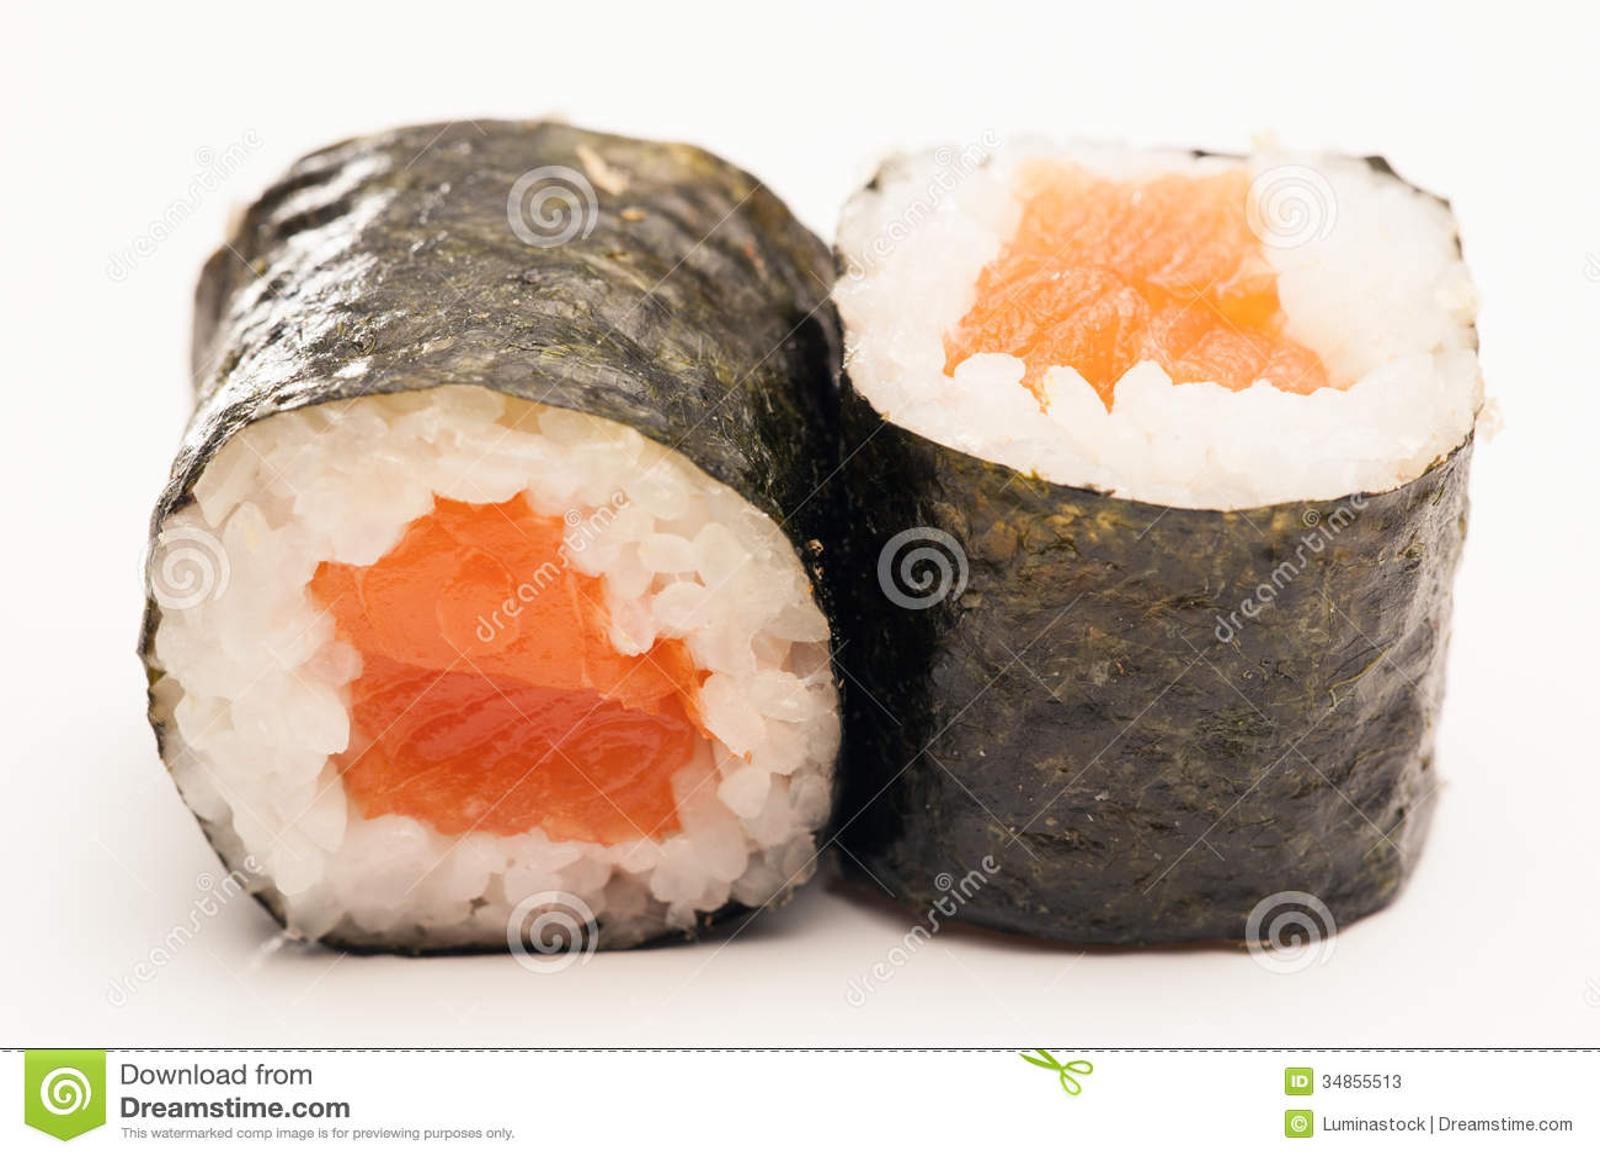 Maki Sushi Rolls Stock Photos - Image: 34855513